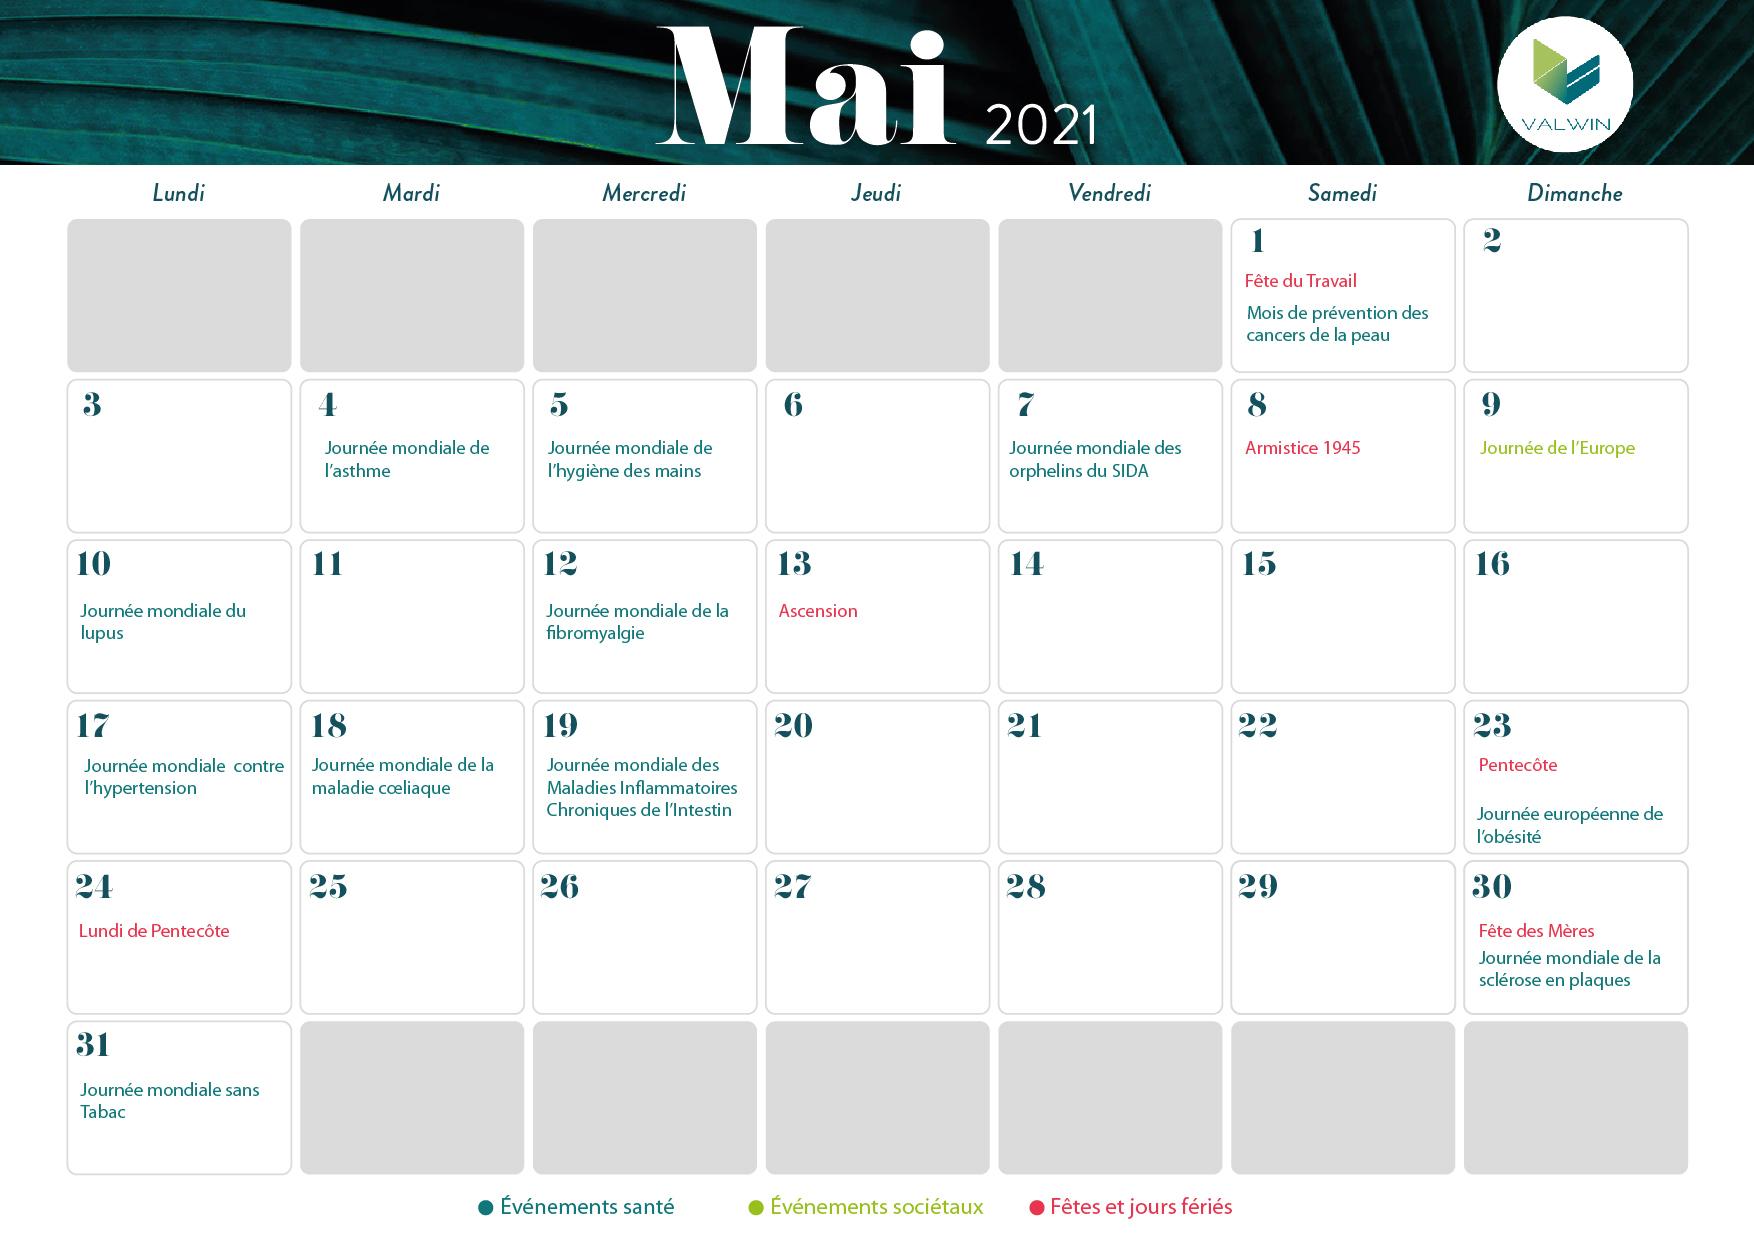 Mai-calendrier-journee-mondiale-sante-2021.jpg